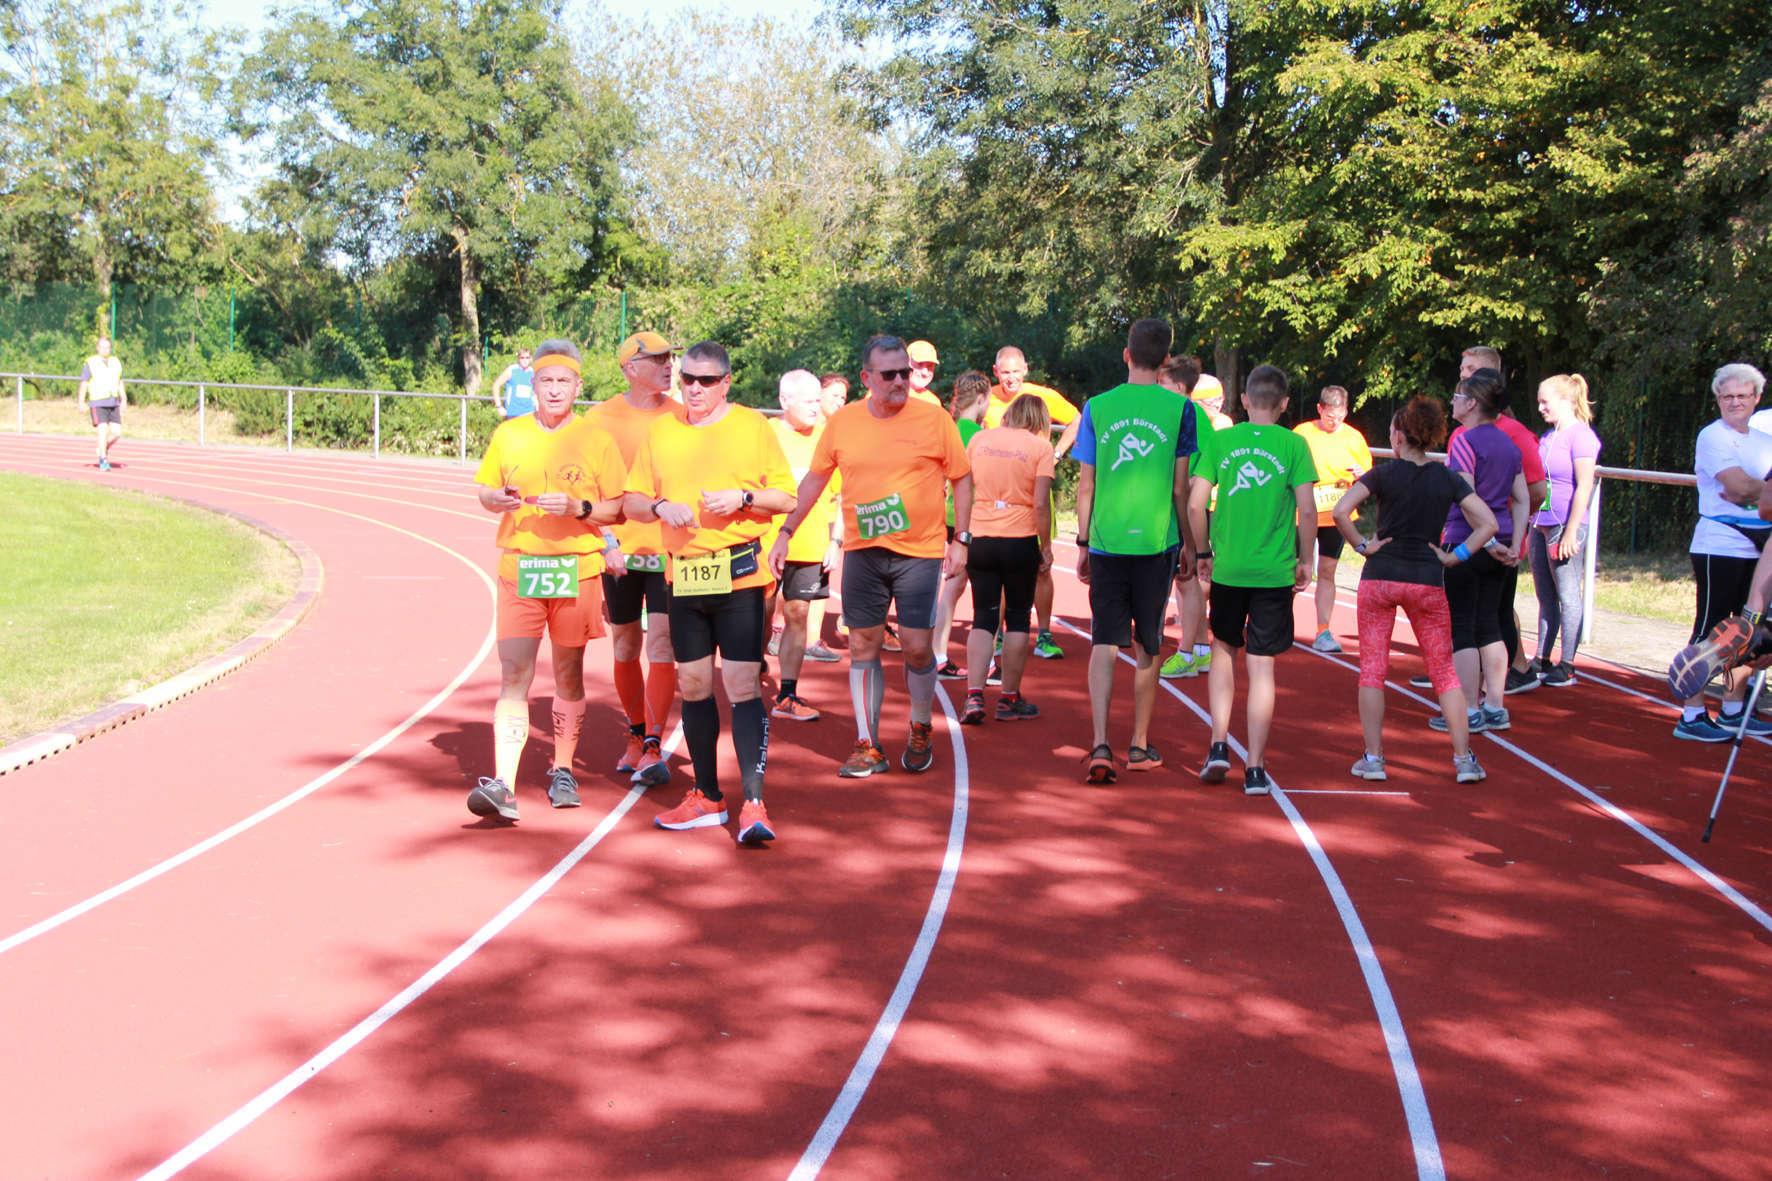 Volkslauf-2019-_-06-_-Start-5-km-_-1